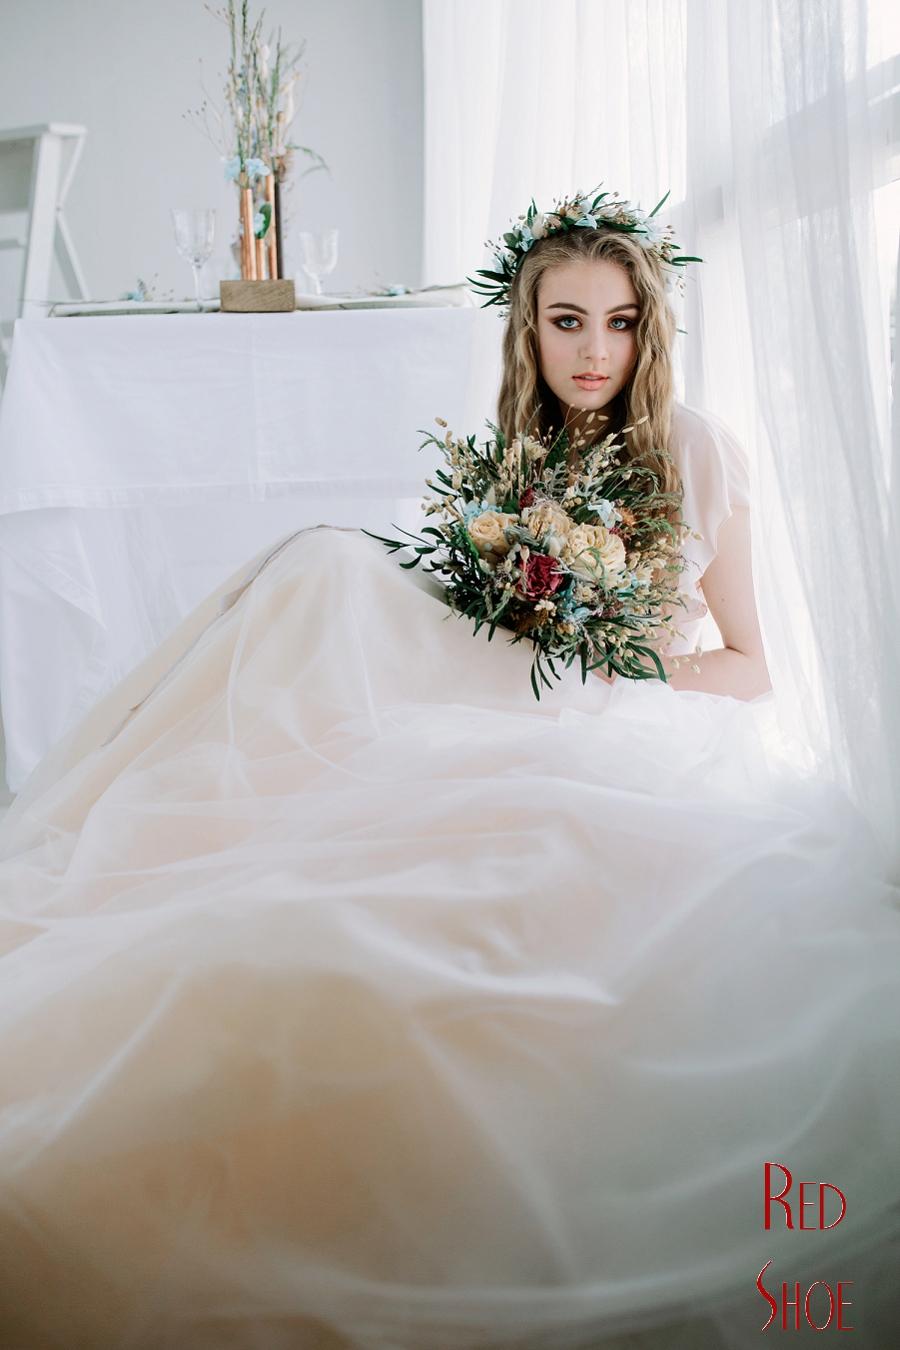 Boho bride, Glam Boho bride, Wedding inspiration, Styled wedding photo shoot, wedding ideas, wedding flower ideas, wedding photography, dried wedding flowers, boho bride makeup ideas_0031.jpg